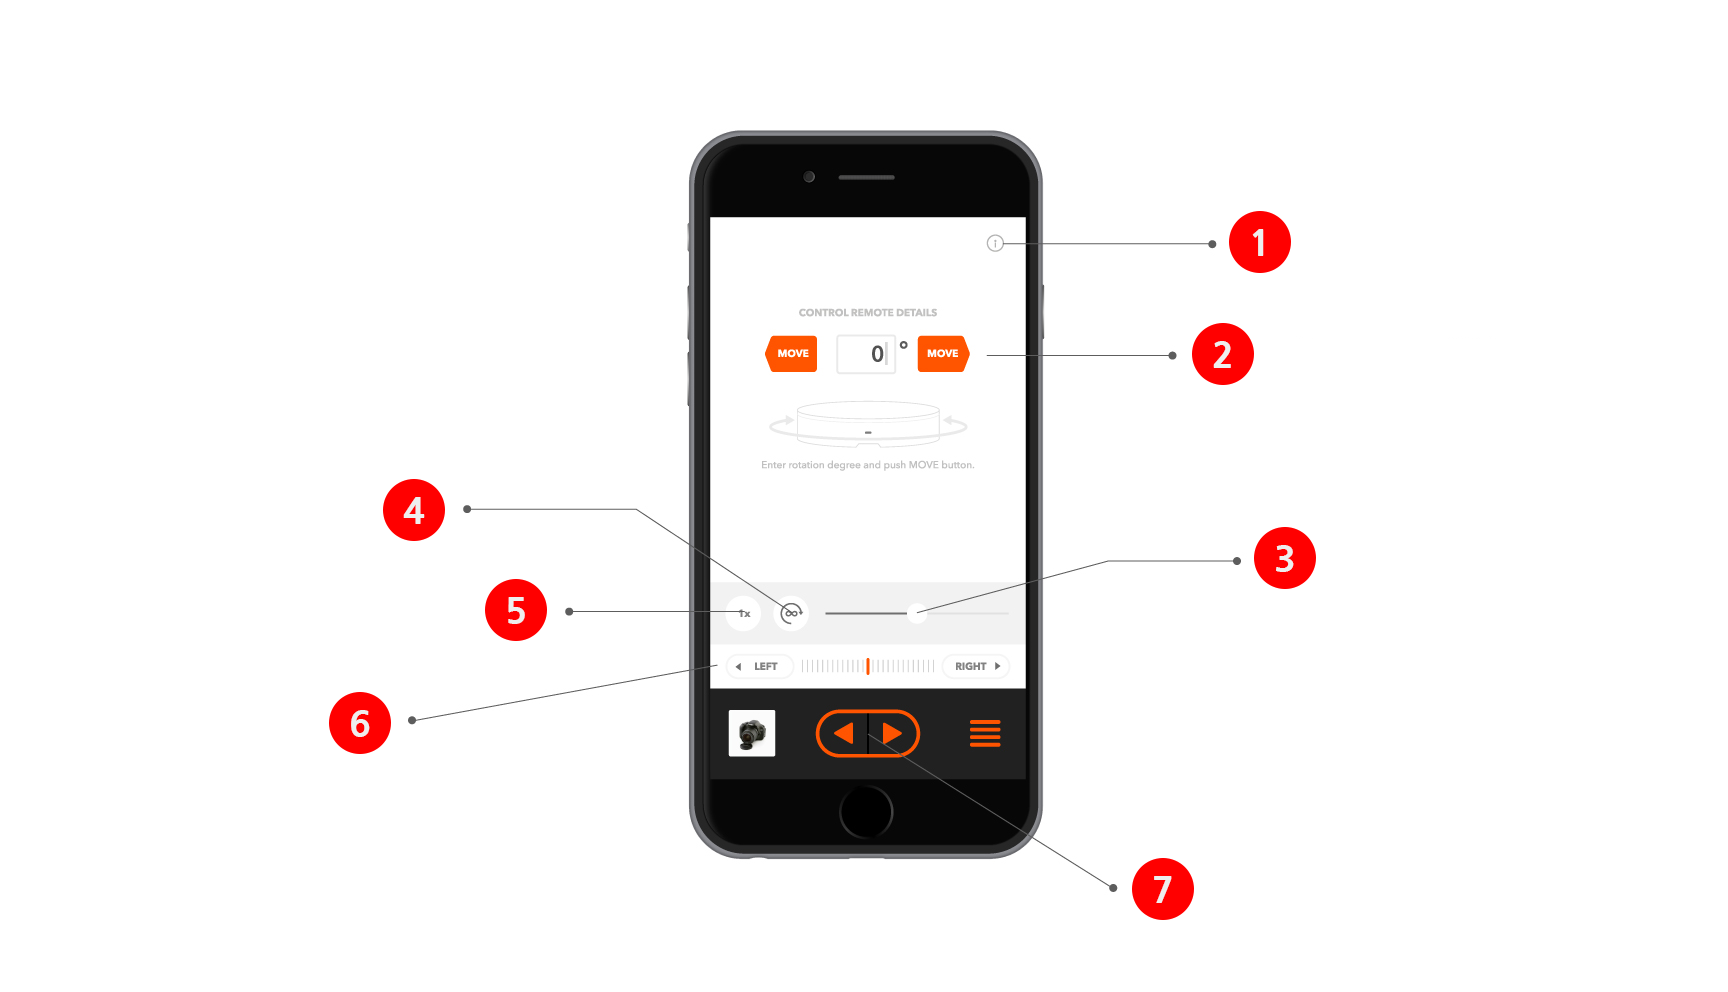 iphone-mode_4control